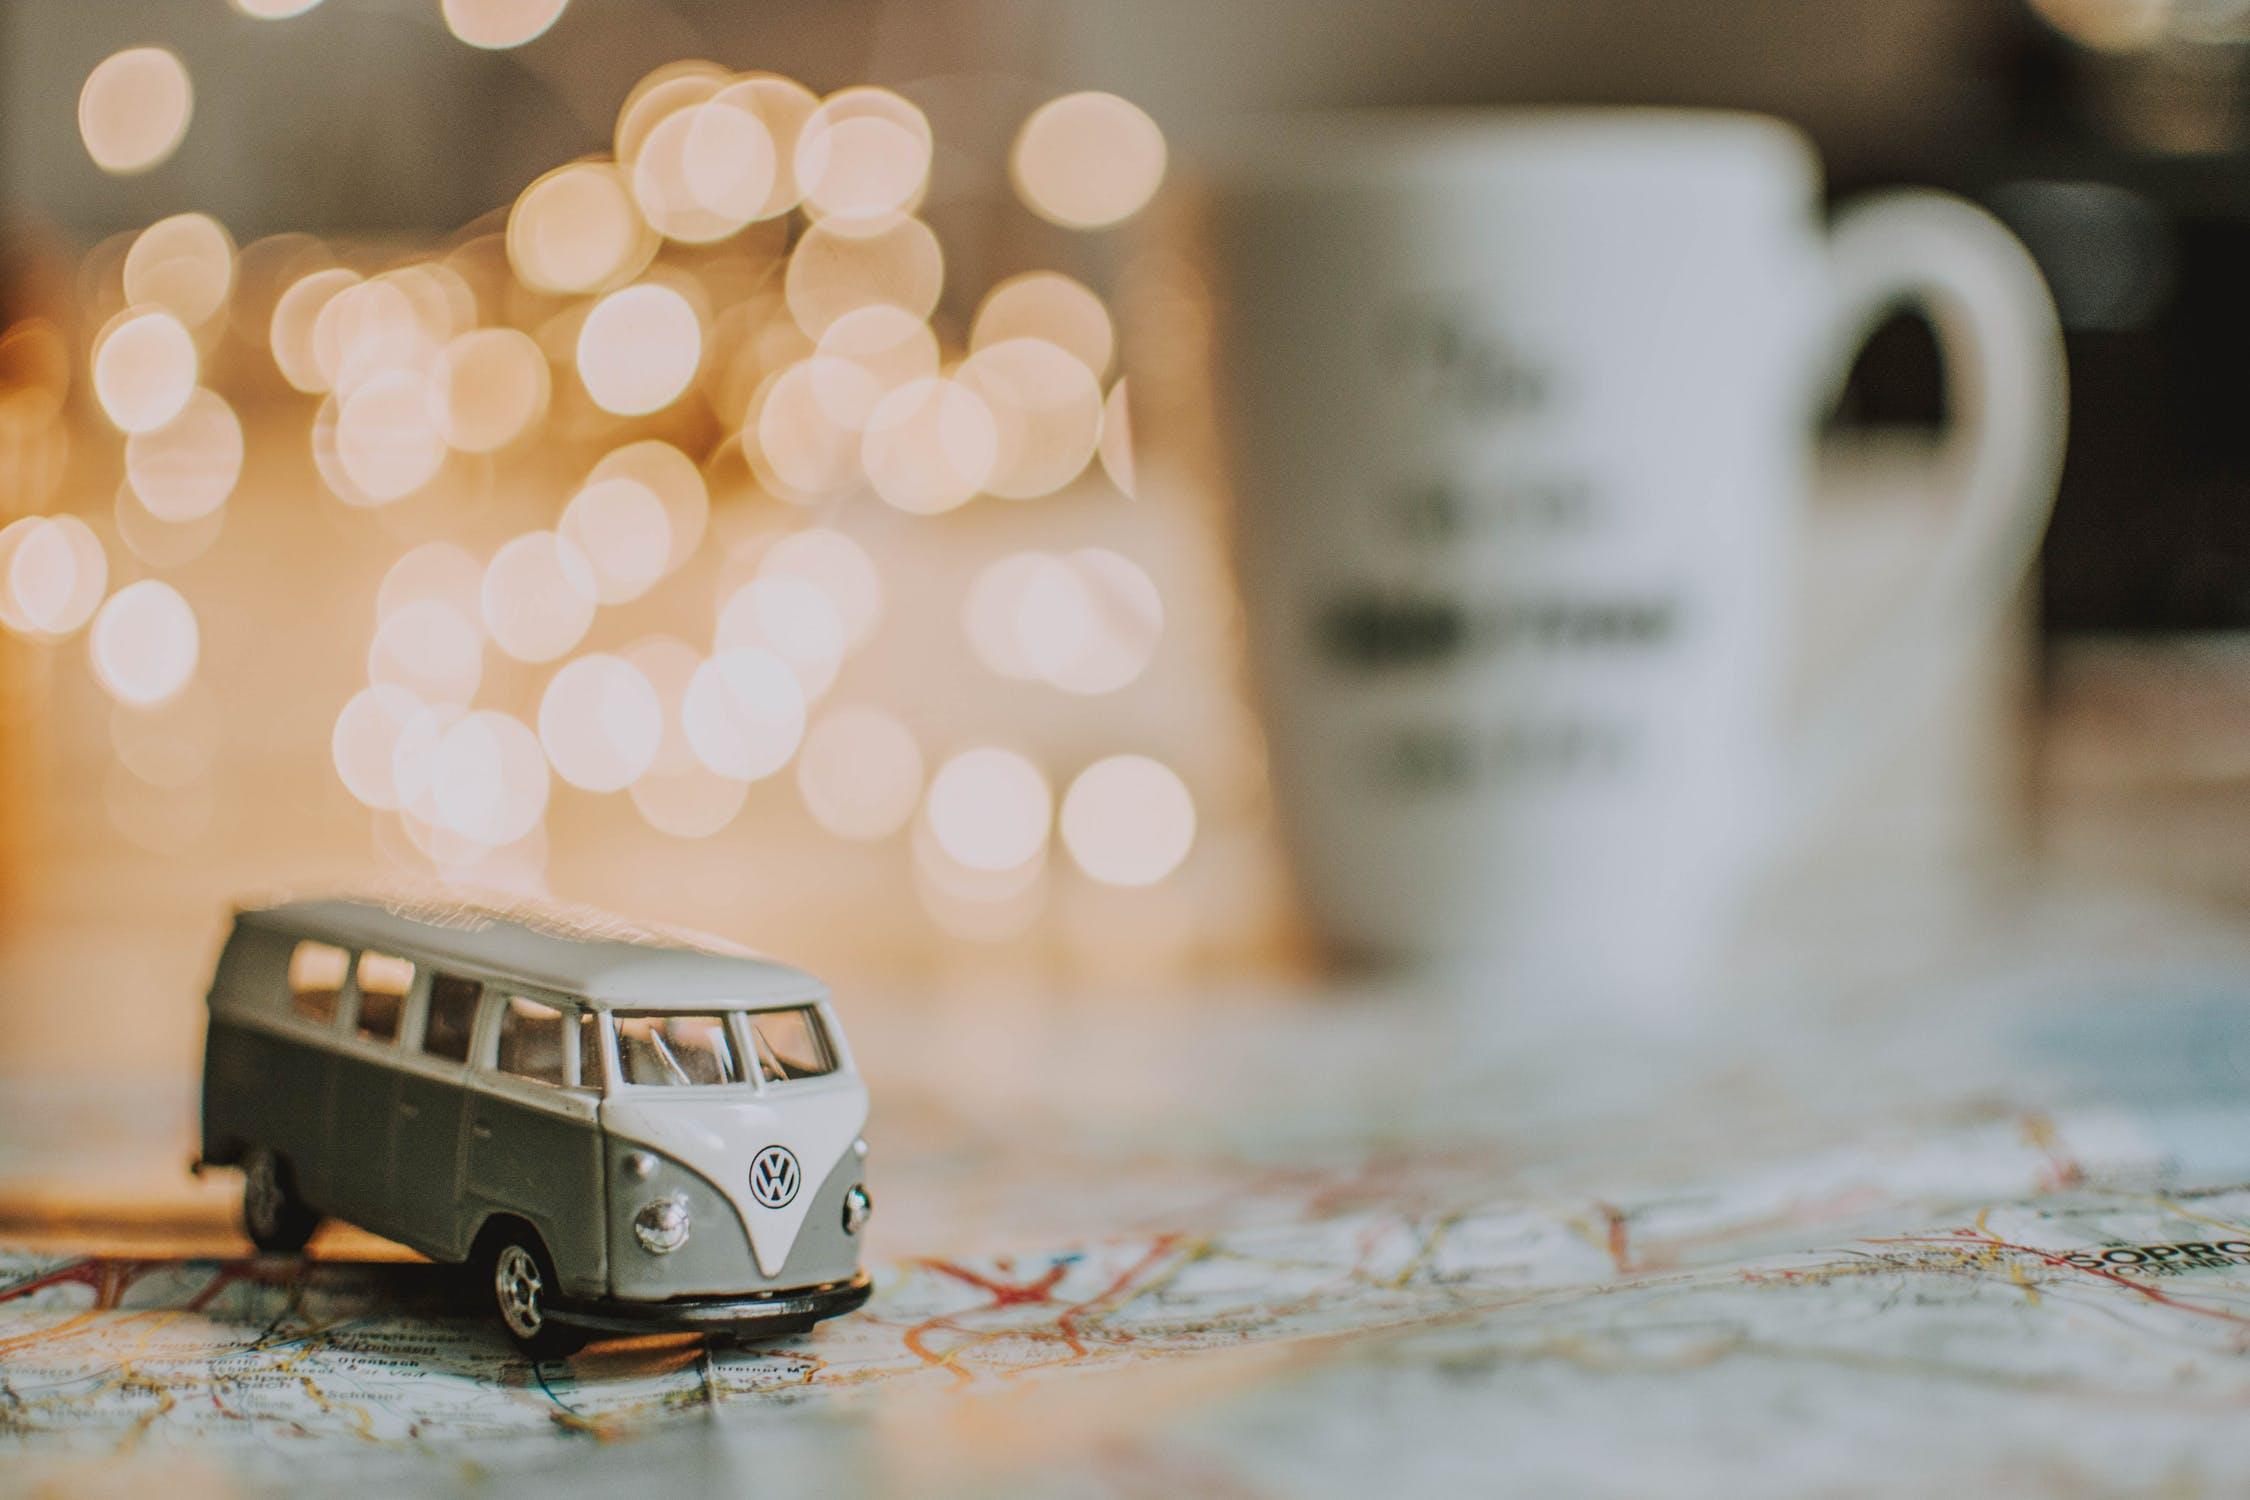 A toy Volkswagen camper van on a table.